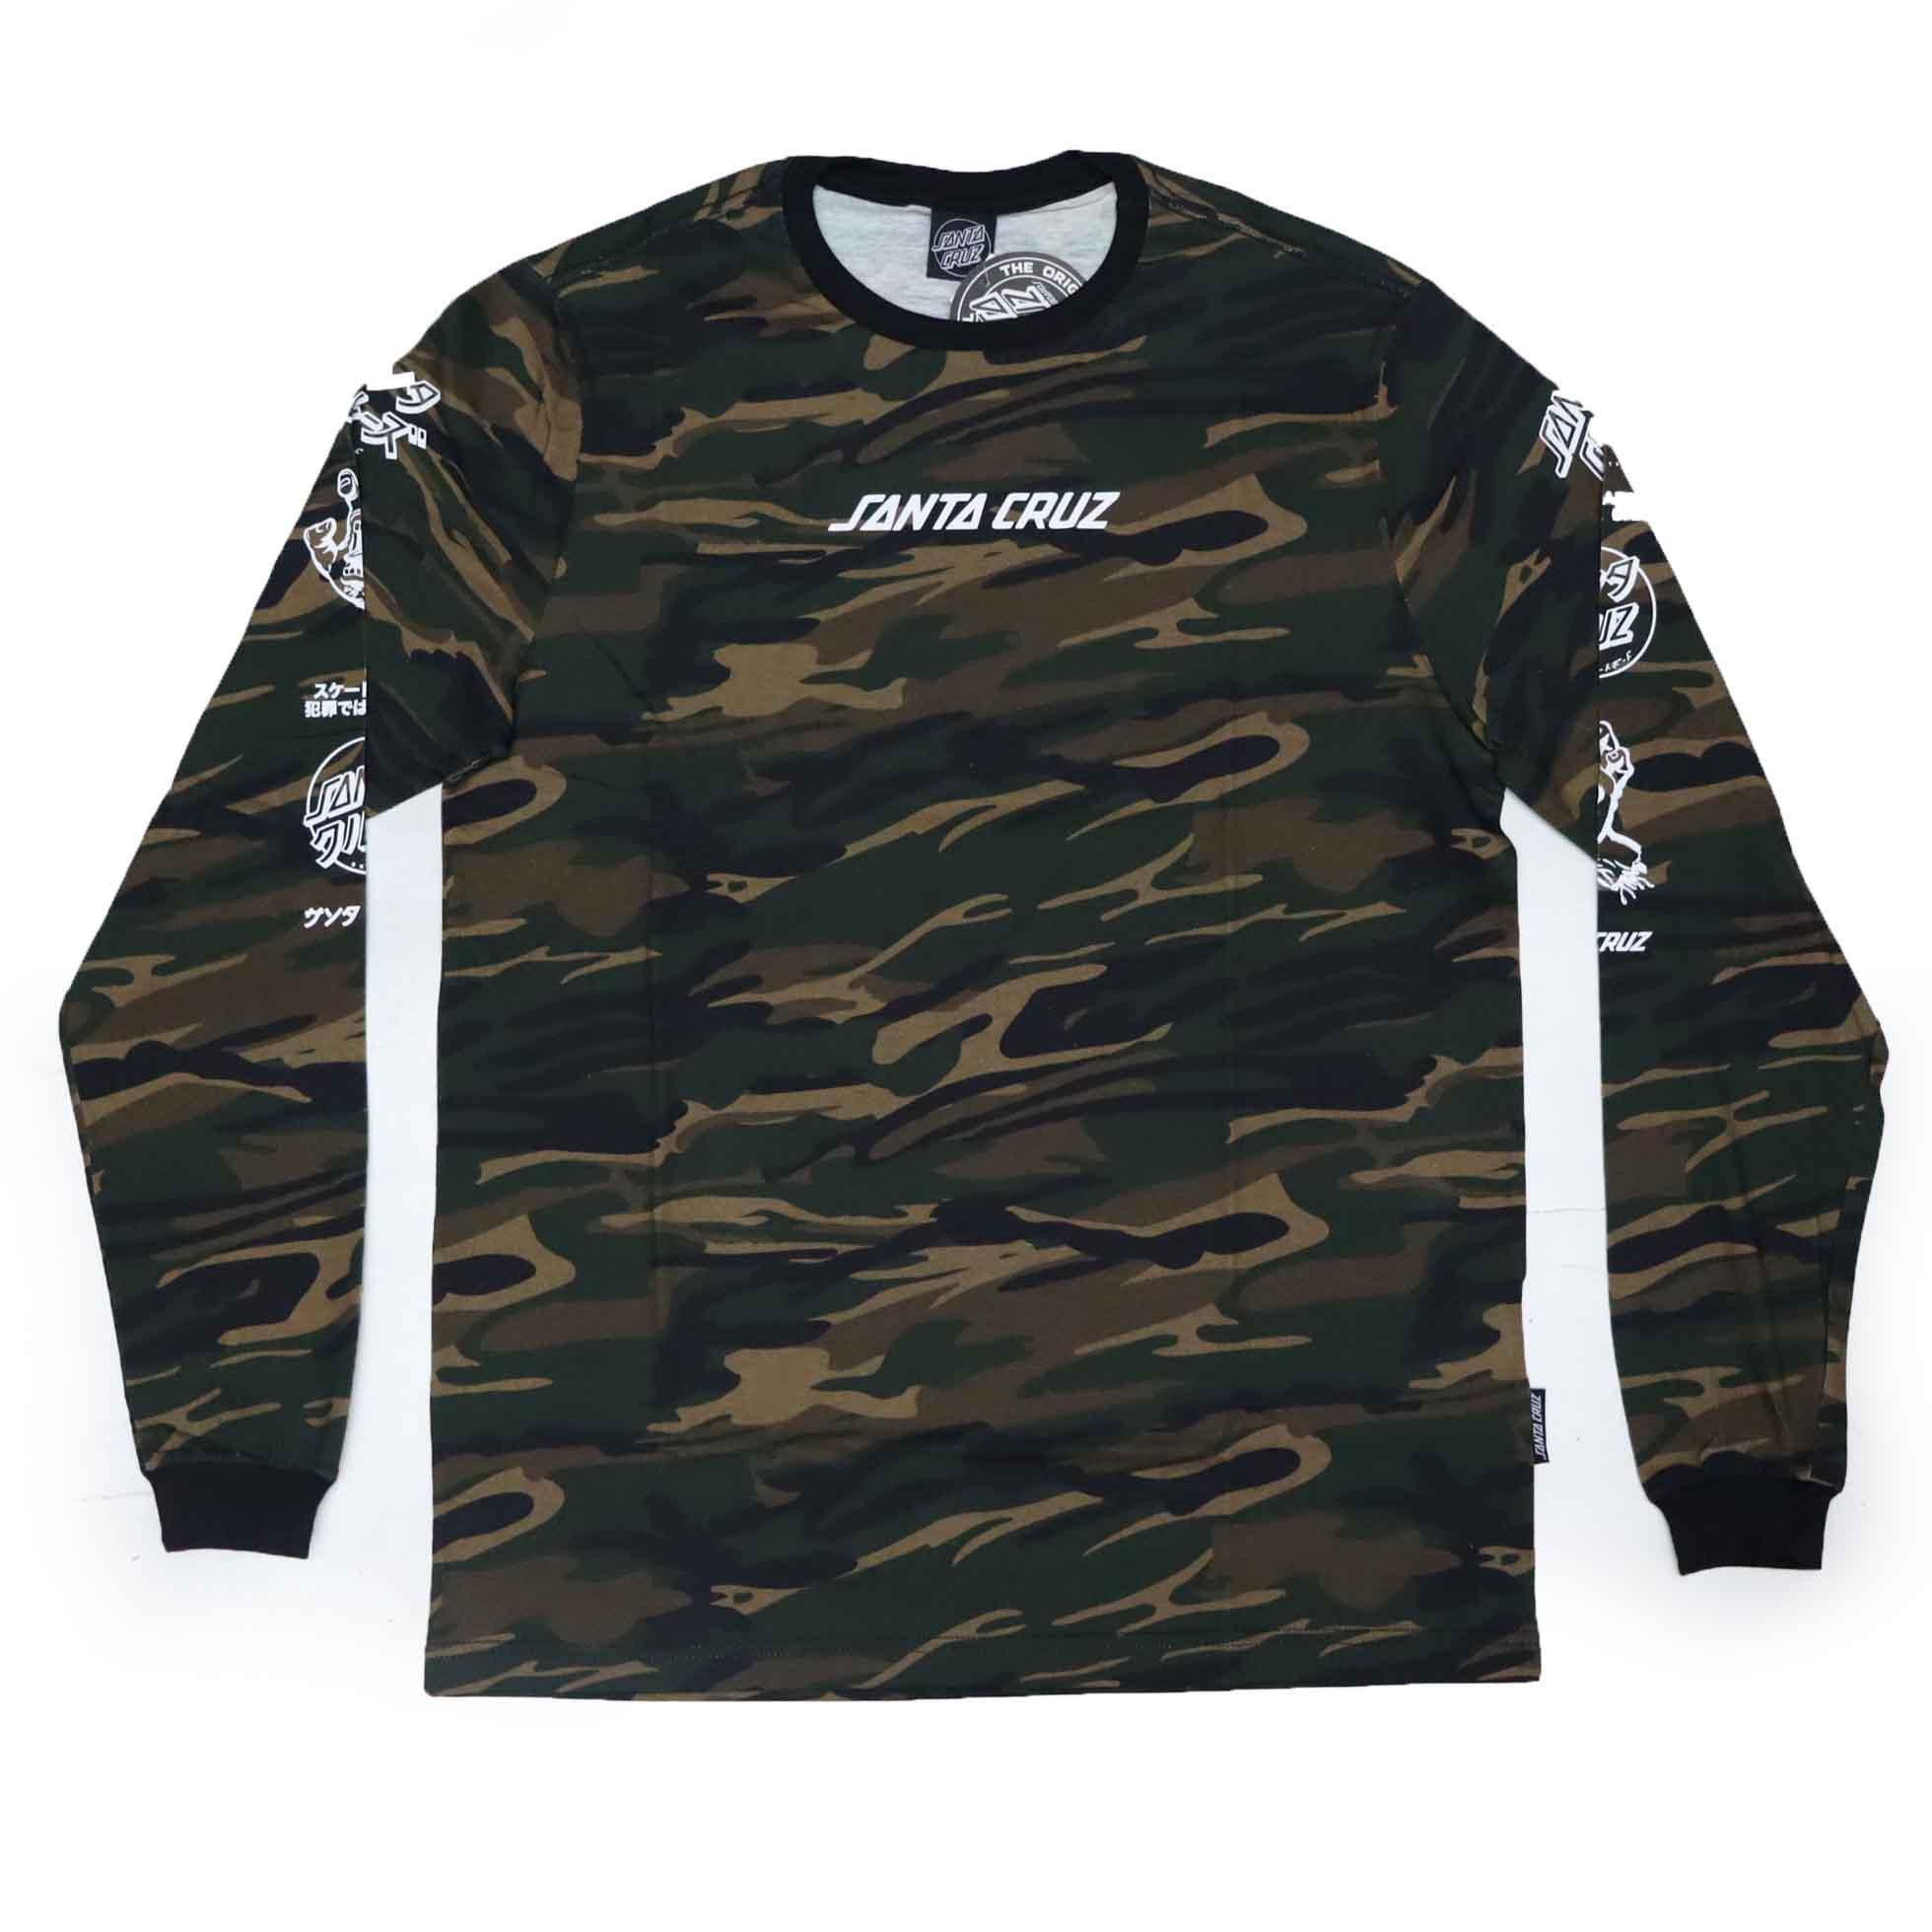 Camiseta Santa Cruz Especial Mixed Up - Camuflado Verde